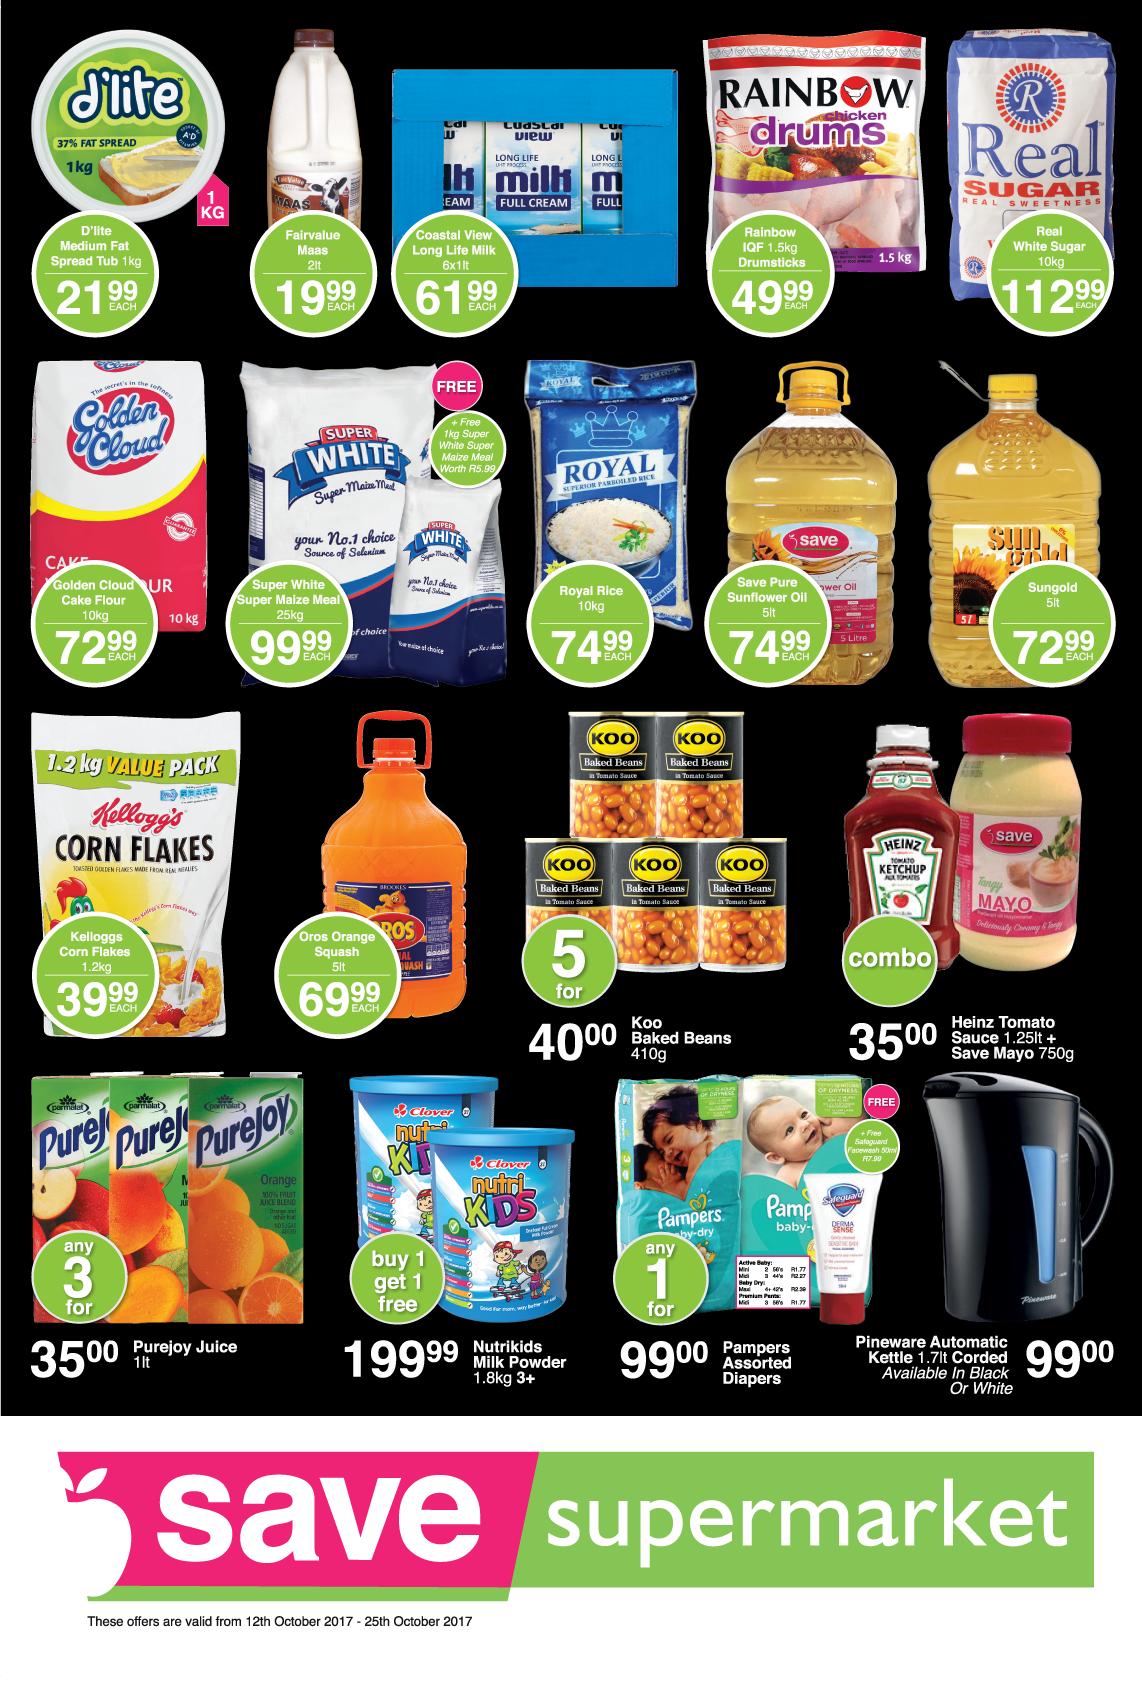 Save Supermarket Church Specials - until 25th October 2017